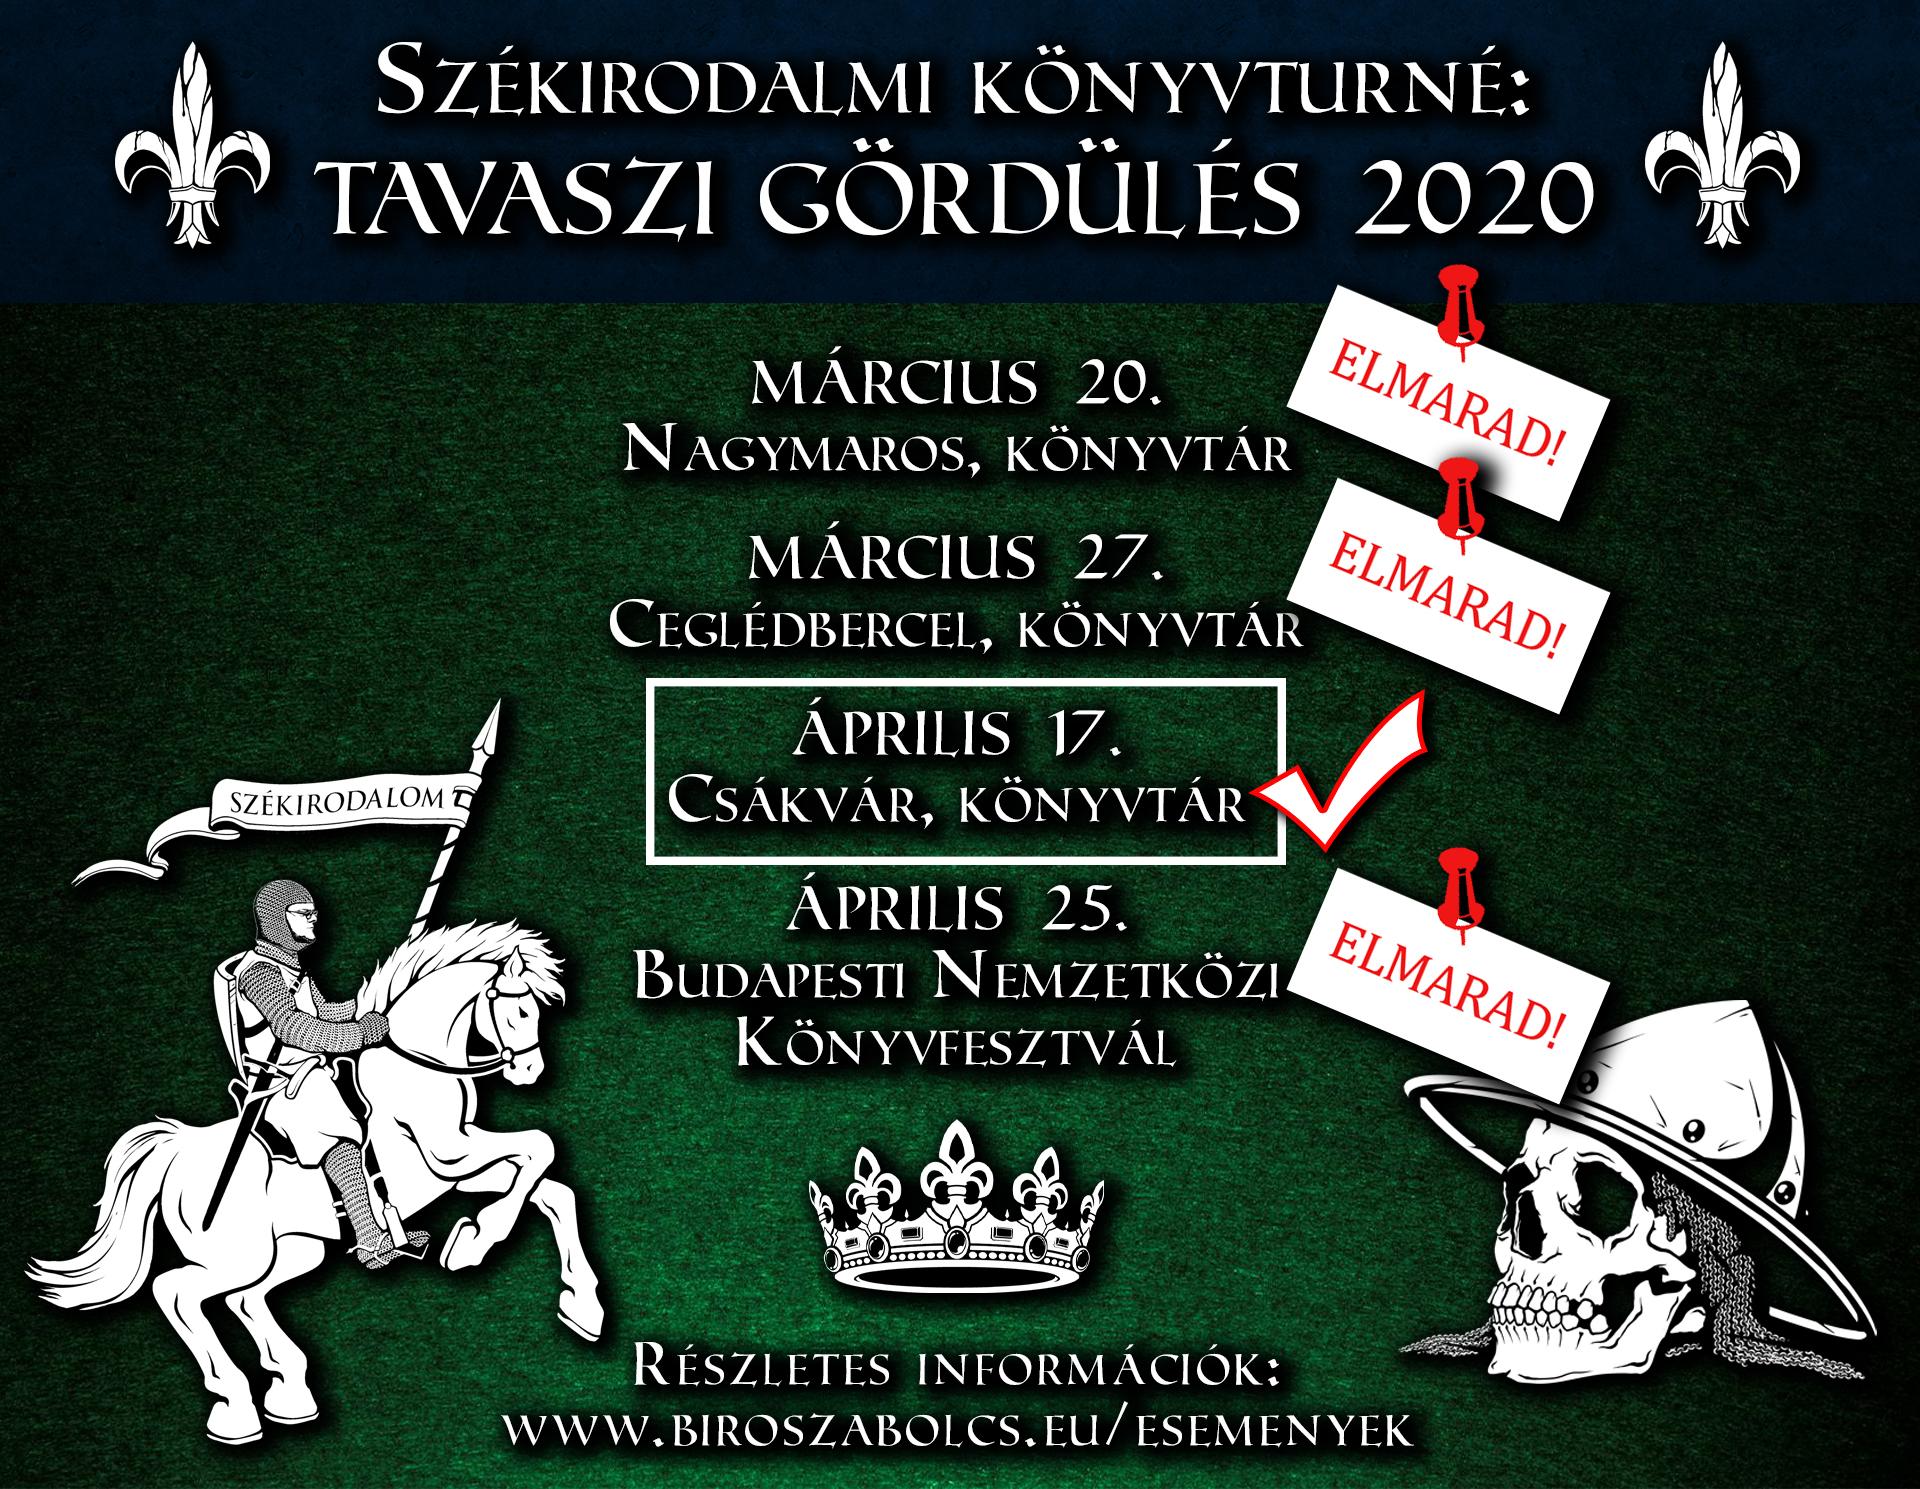 tavaszi_gordules_2020_torolve.jpg